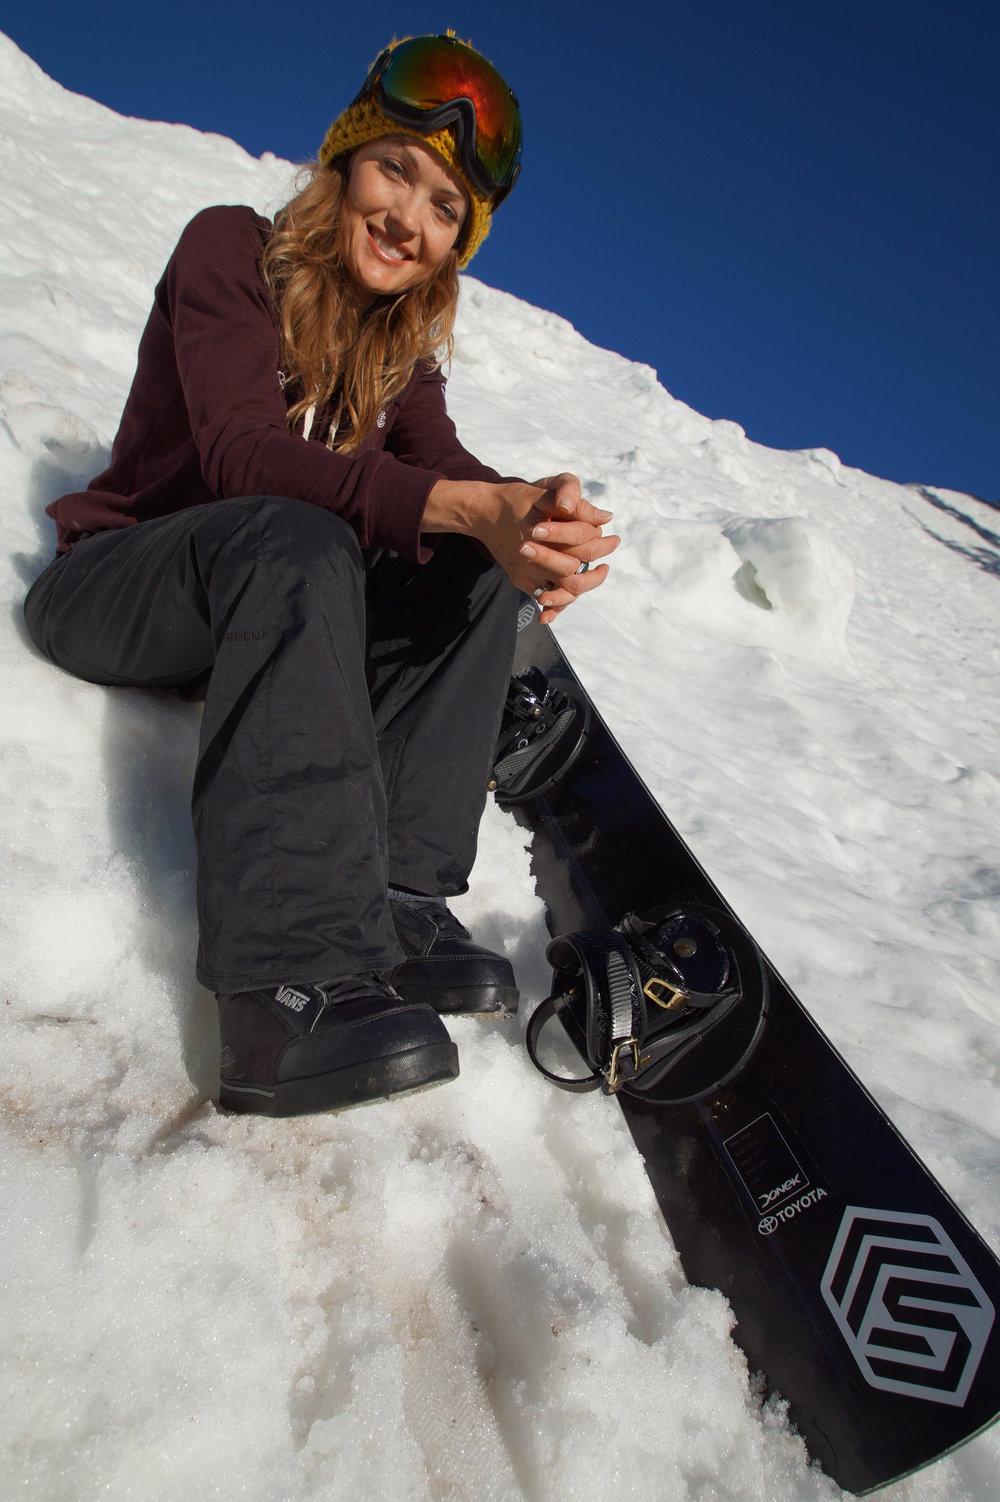 Amy purdy , World class snowboarder, motivational speaker